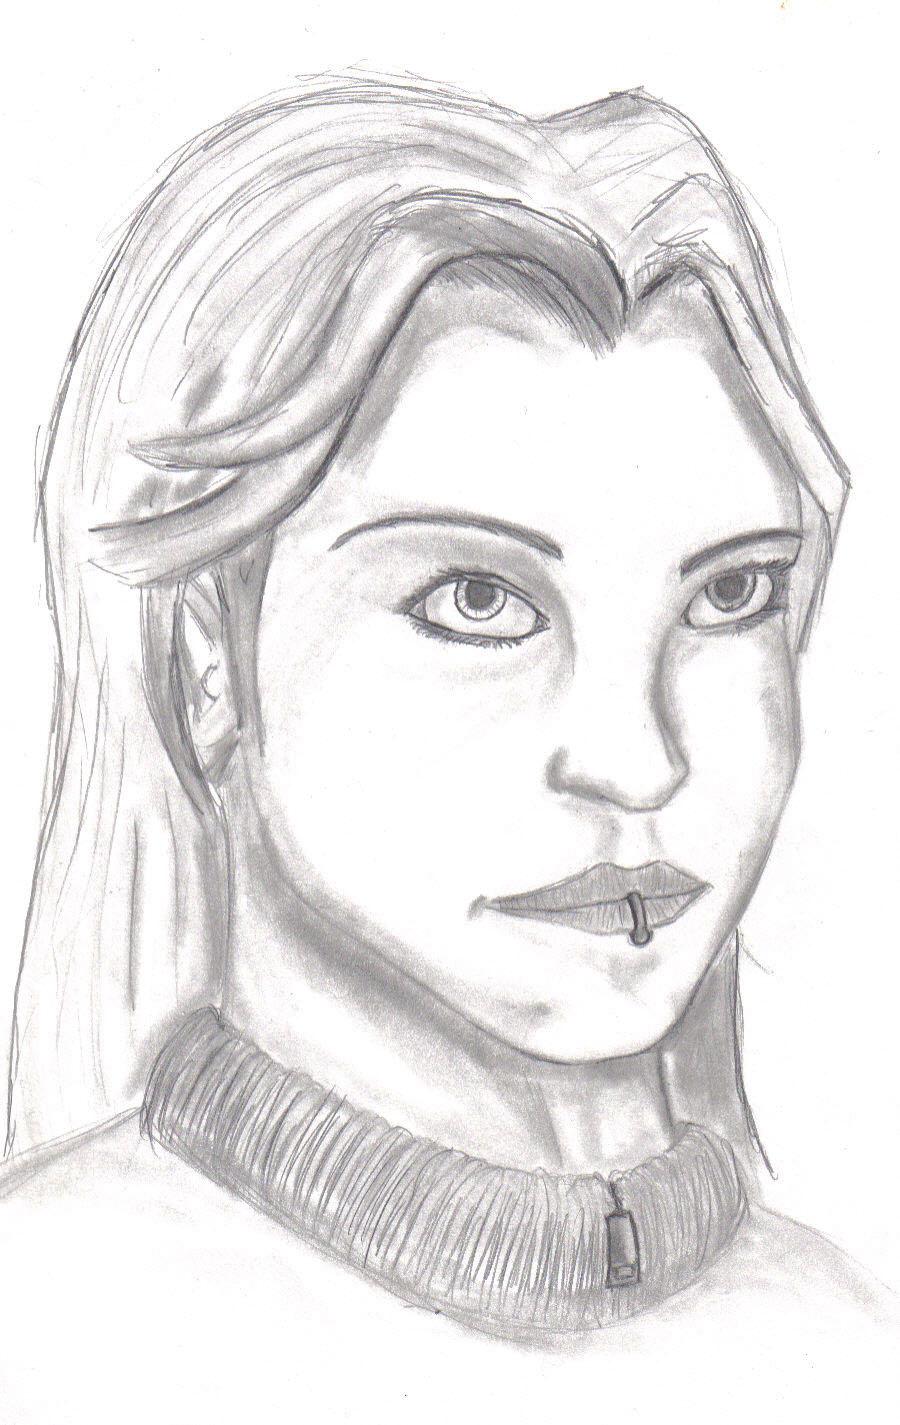 Face by SvirreFisk